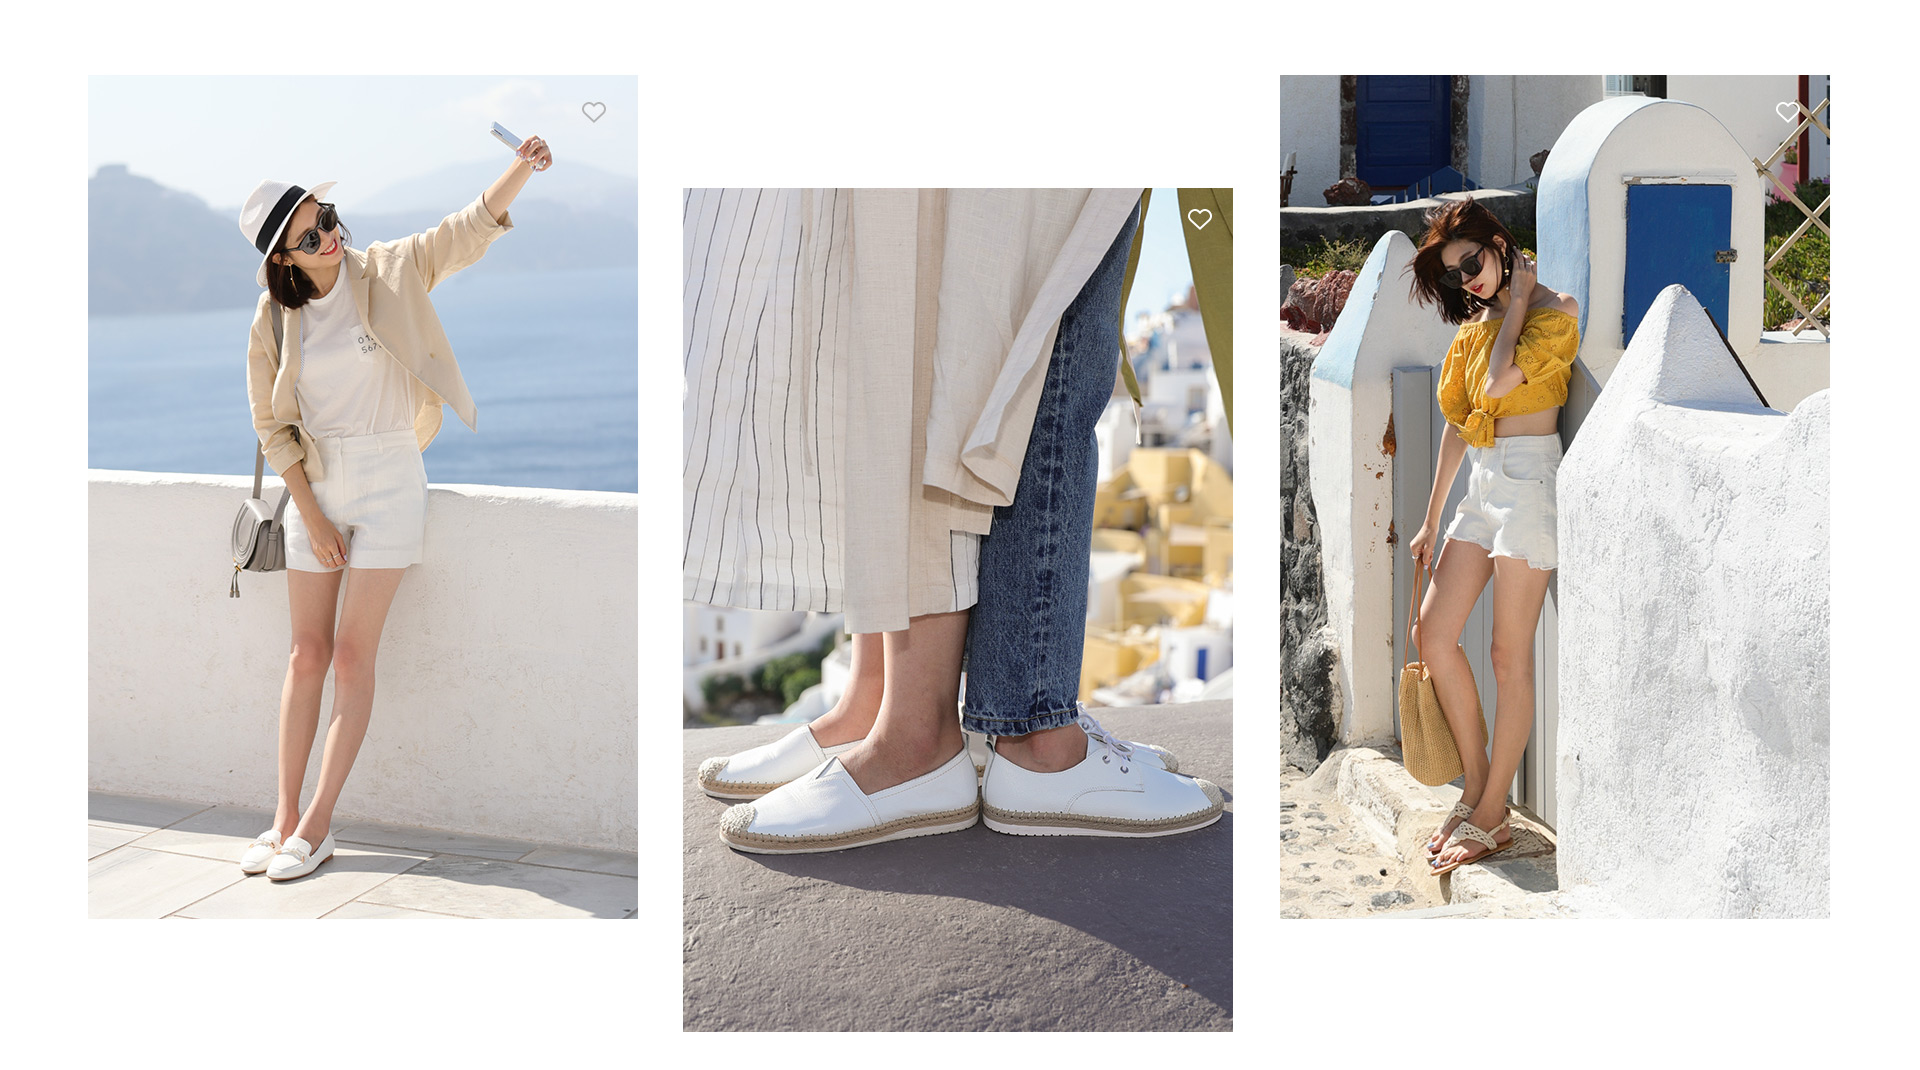 D+AF希臘拍攝特輯新款涼鞋女鞋現折$500